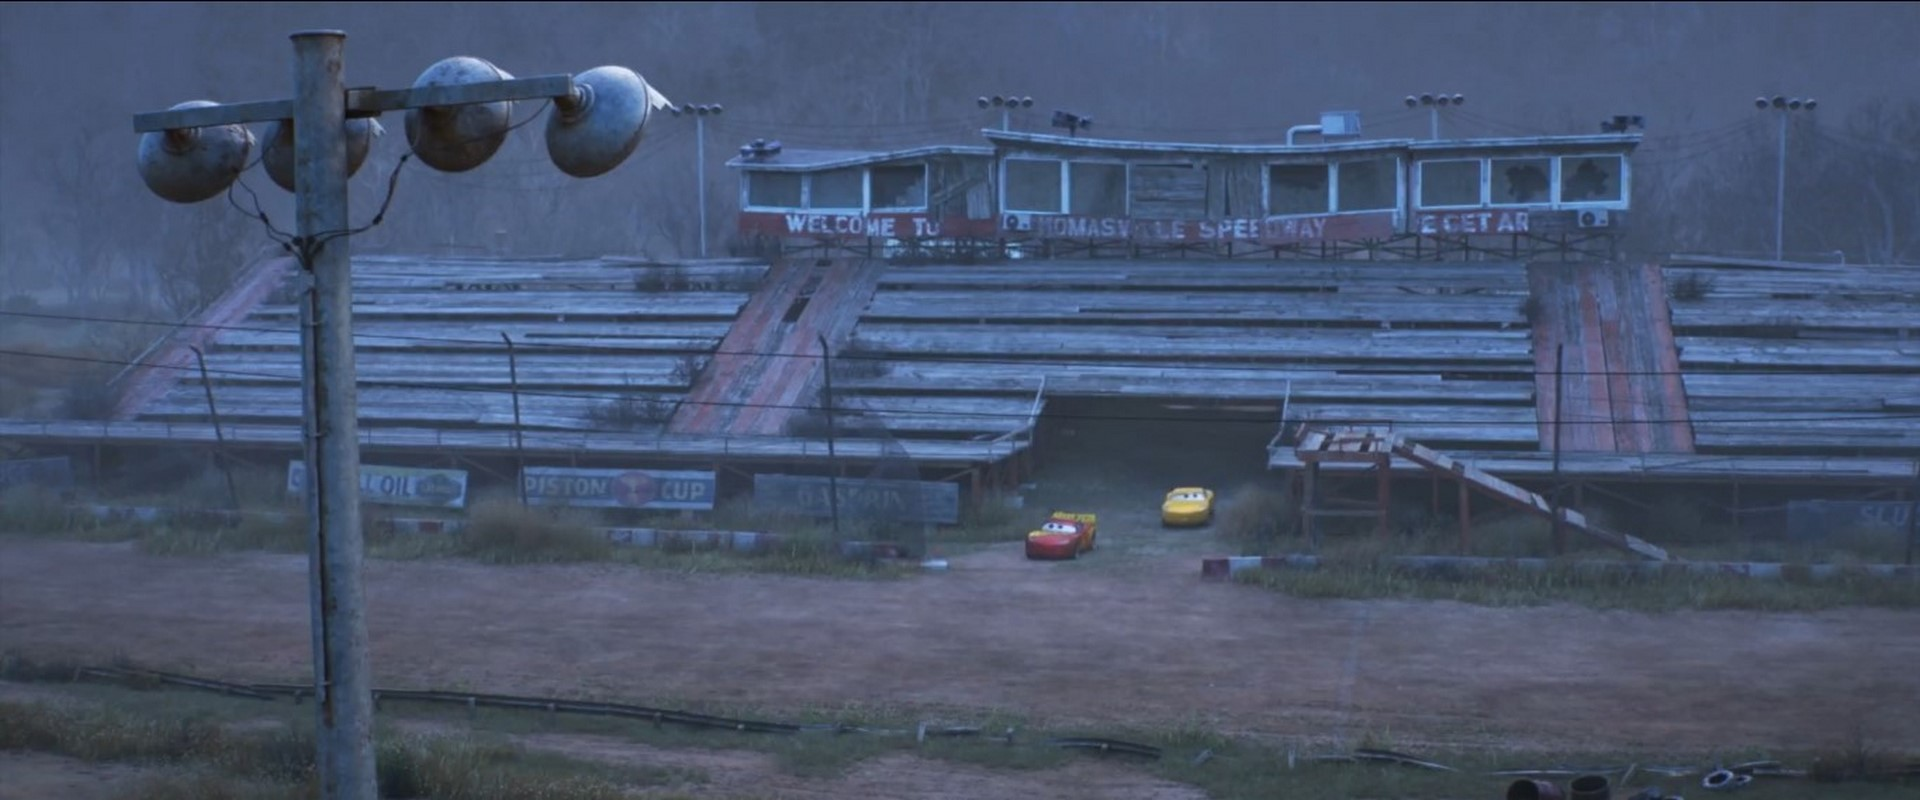 Autódromo de Thomasville